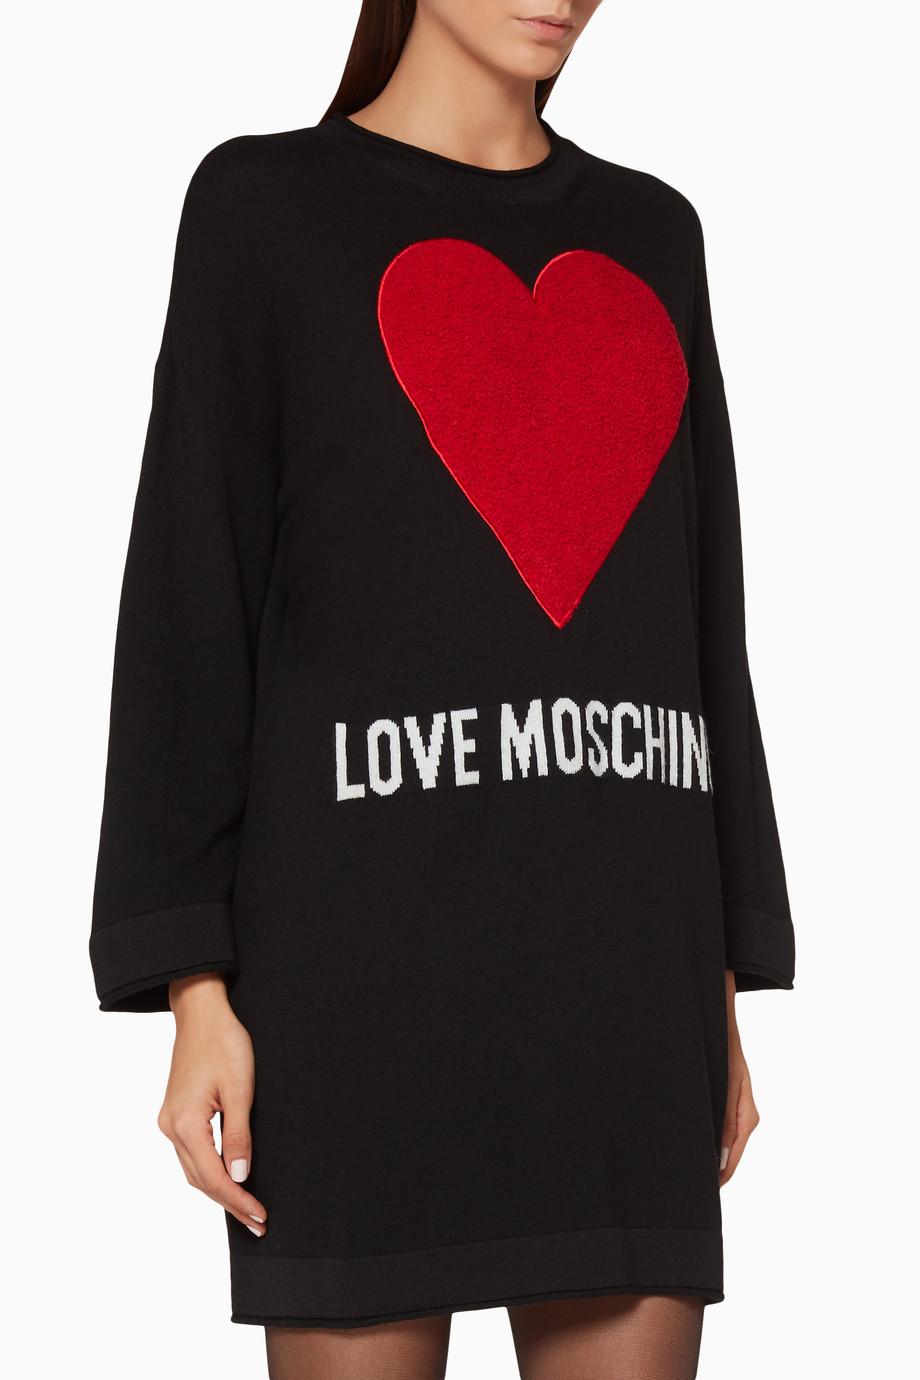 6d1fdc0fd Shop Moschino Black Black Heart-Appliqué Sweater Dress for Women ...